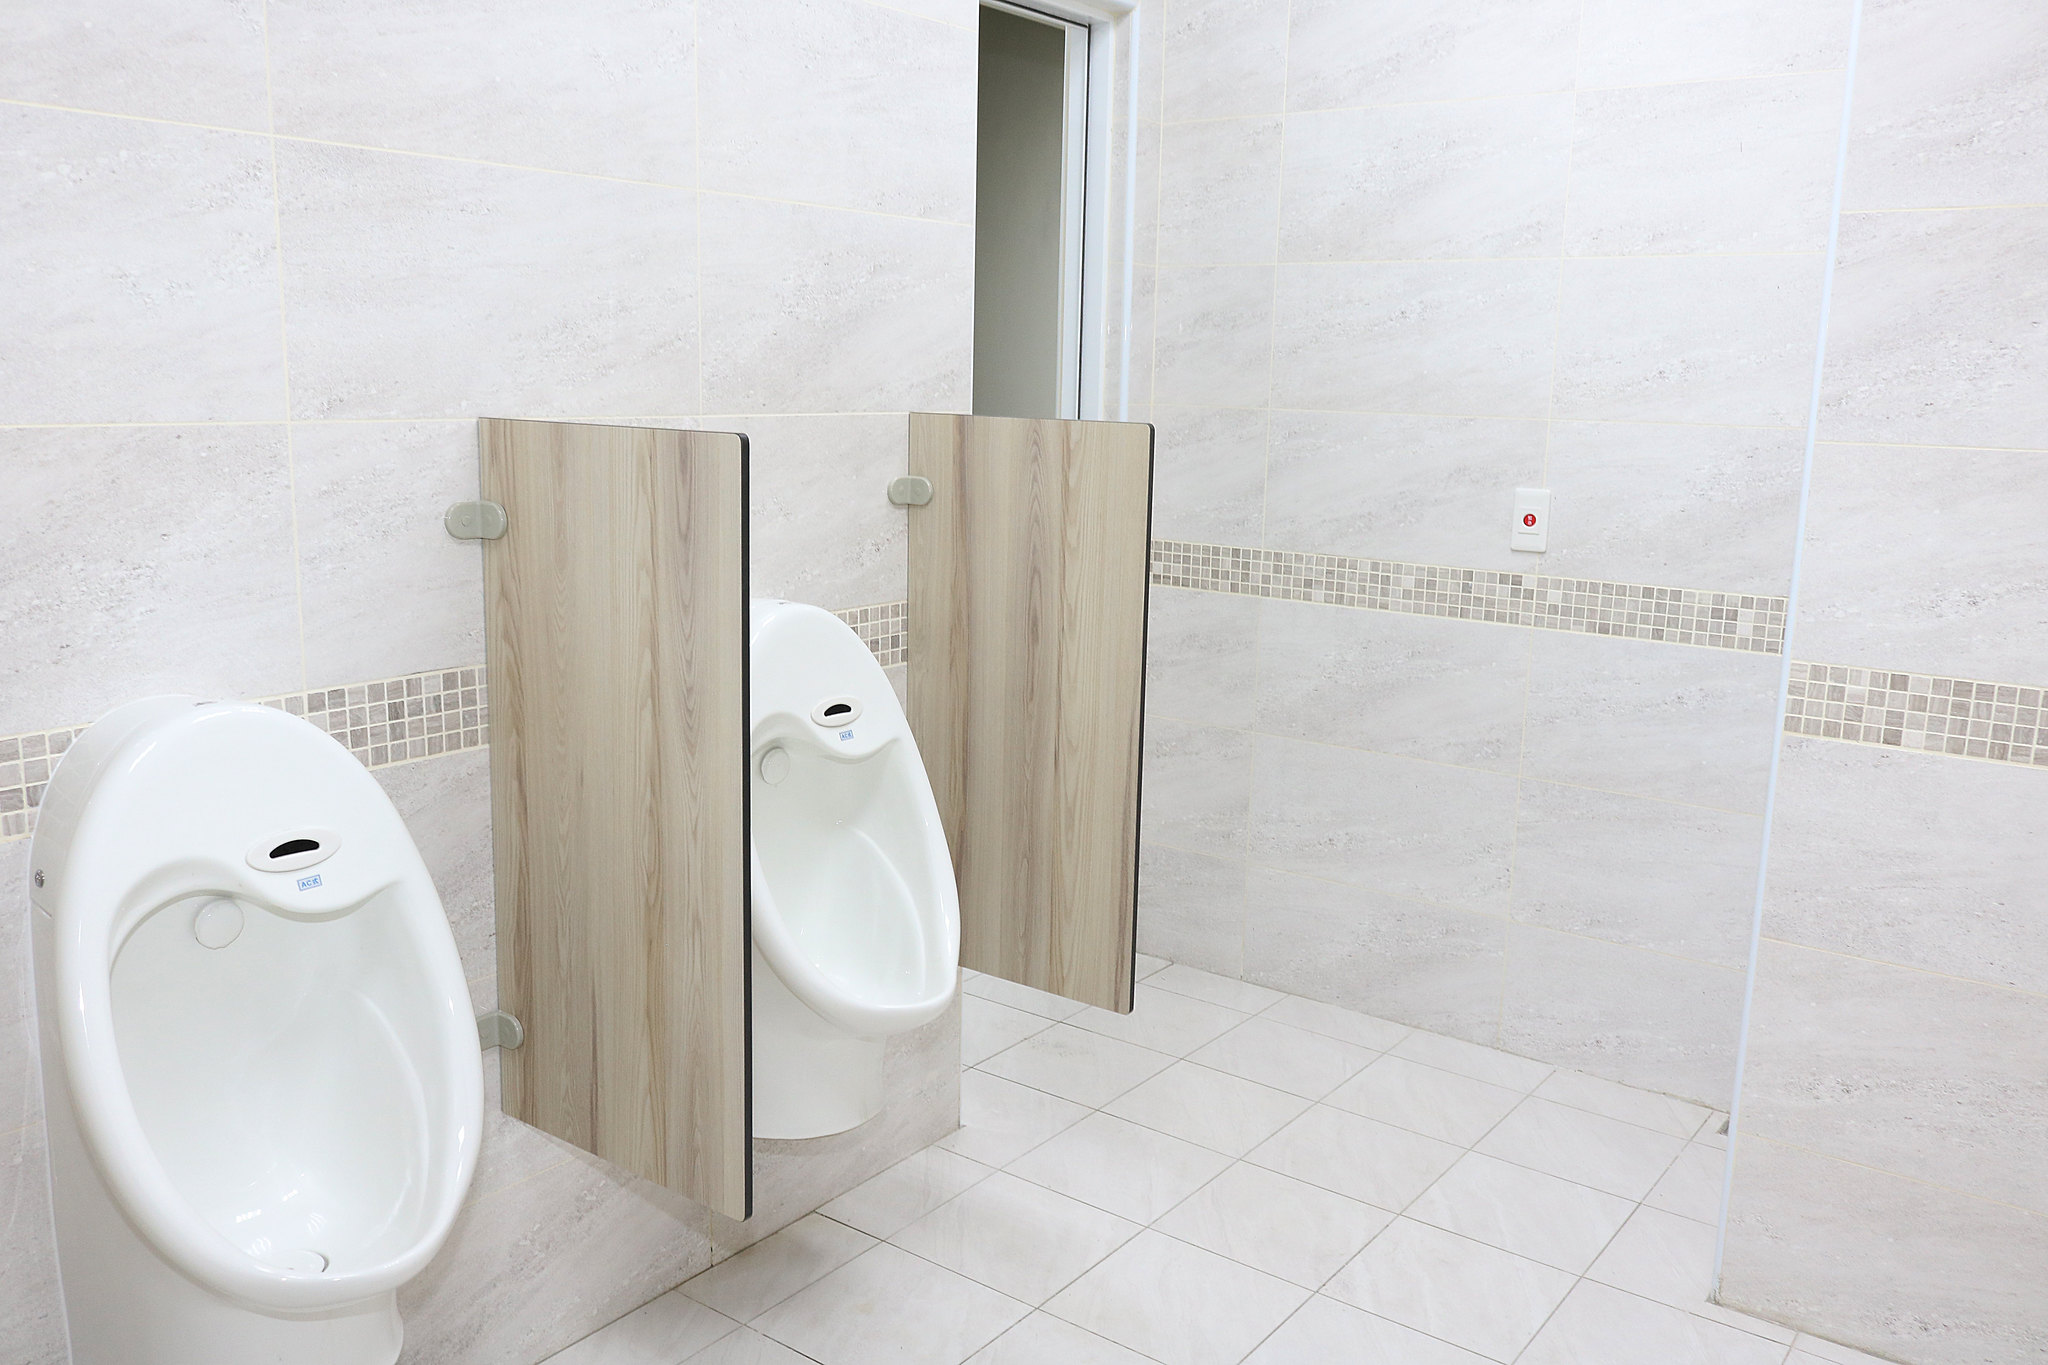 cb廁所2